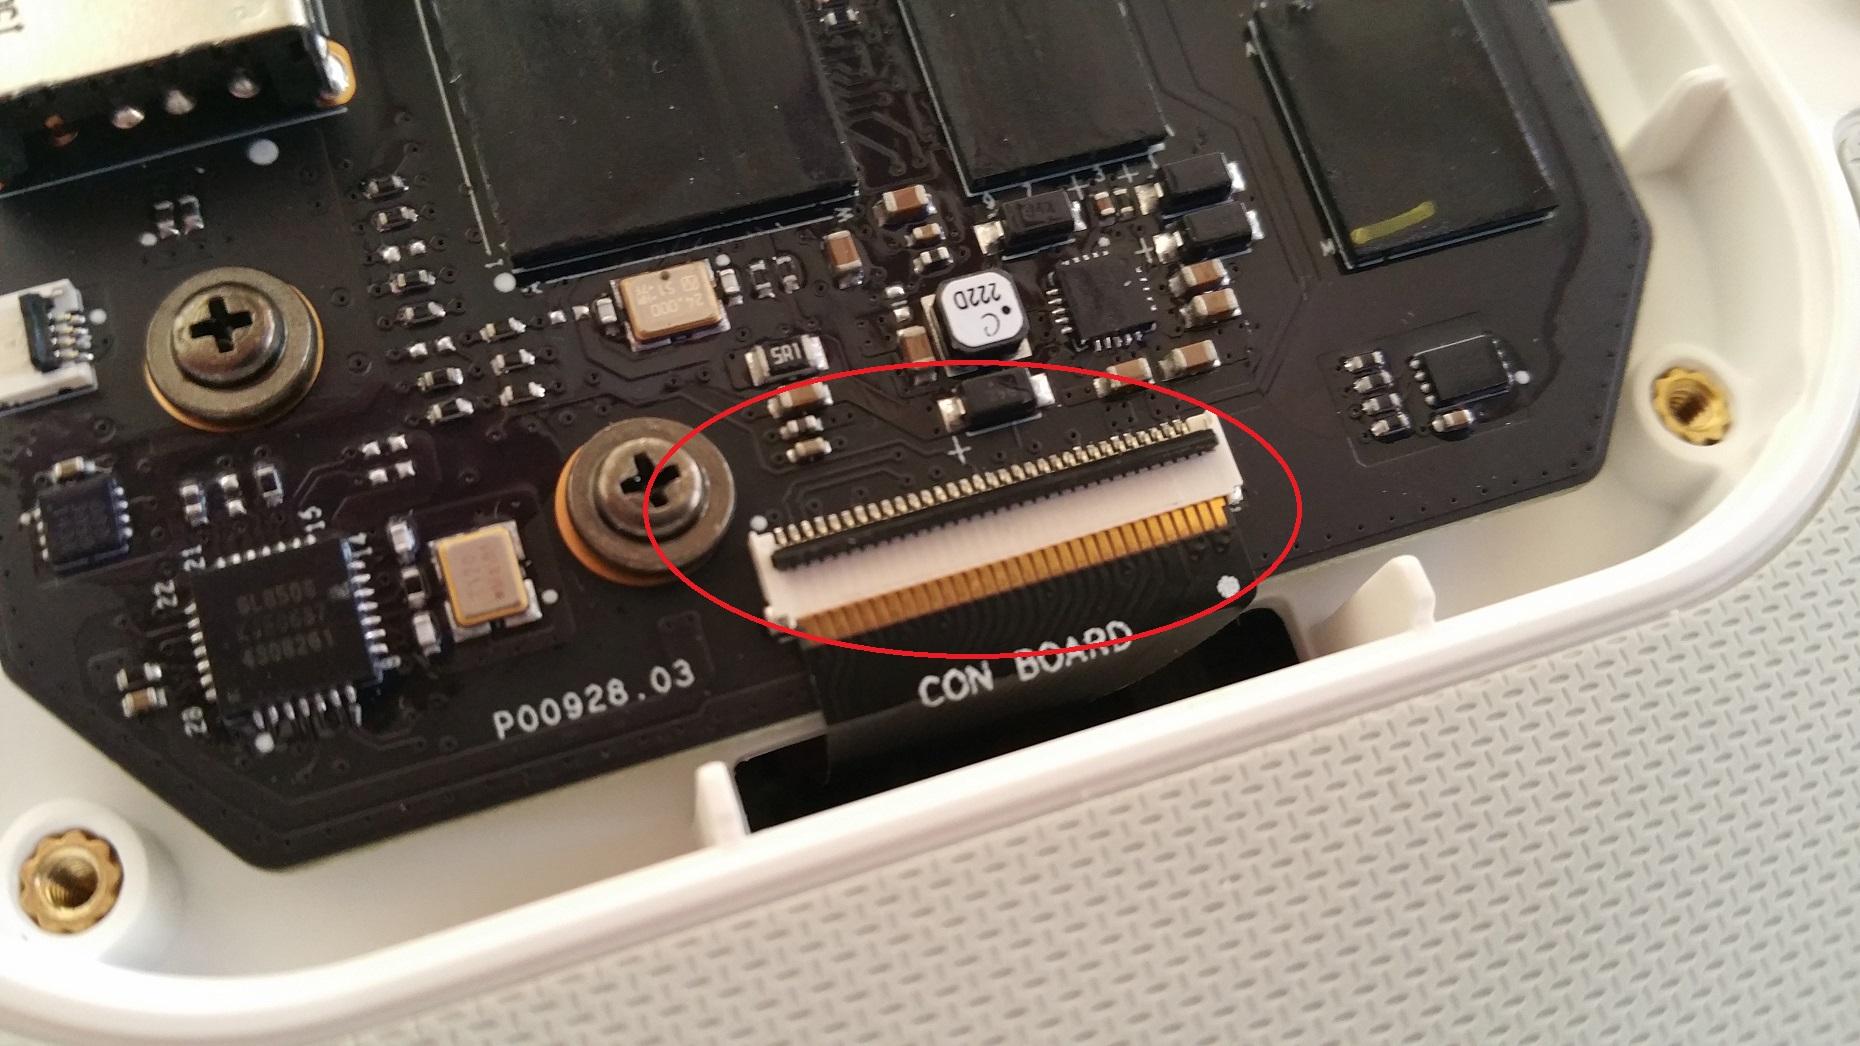 Dji Phantom 3 Hdmi Upgrade Board Rc Groups